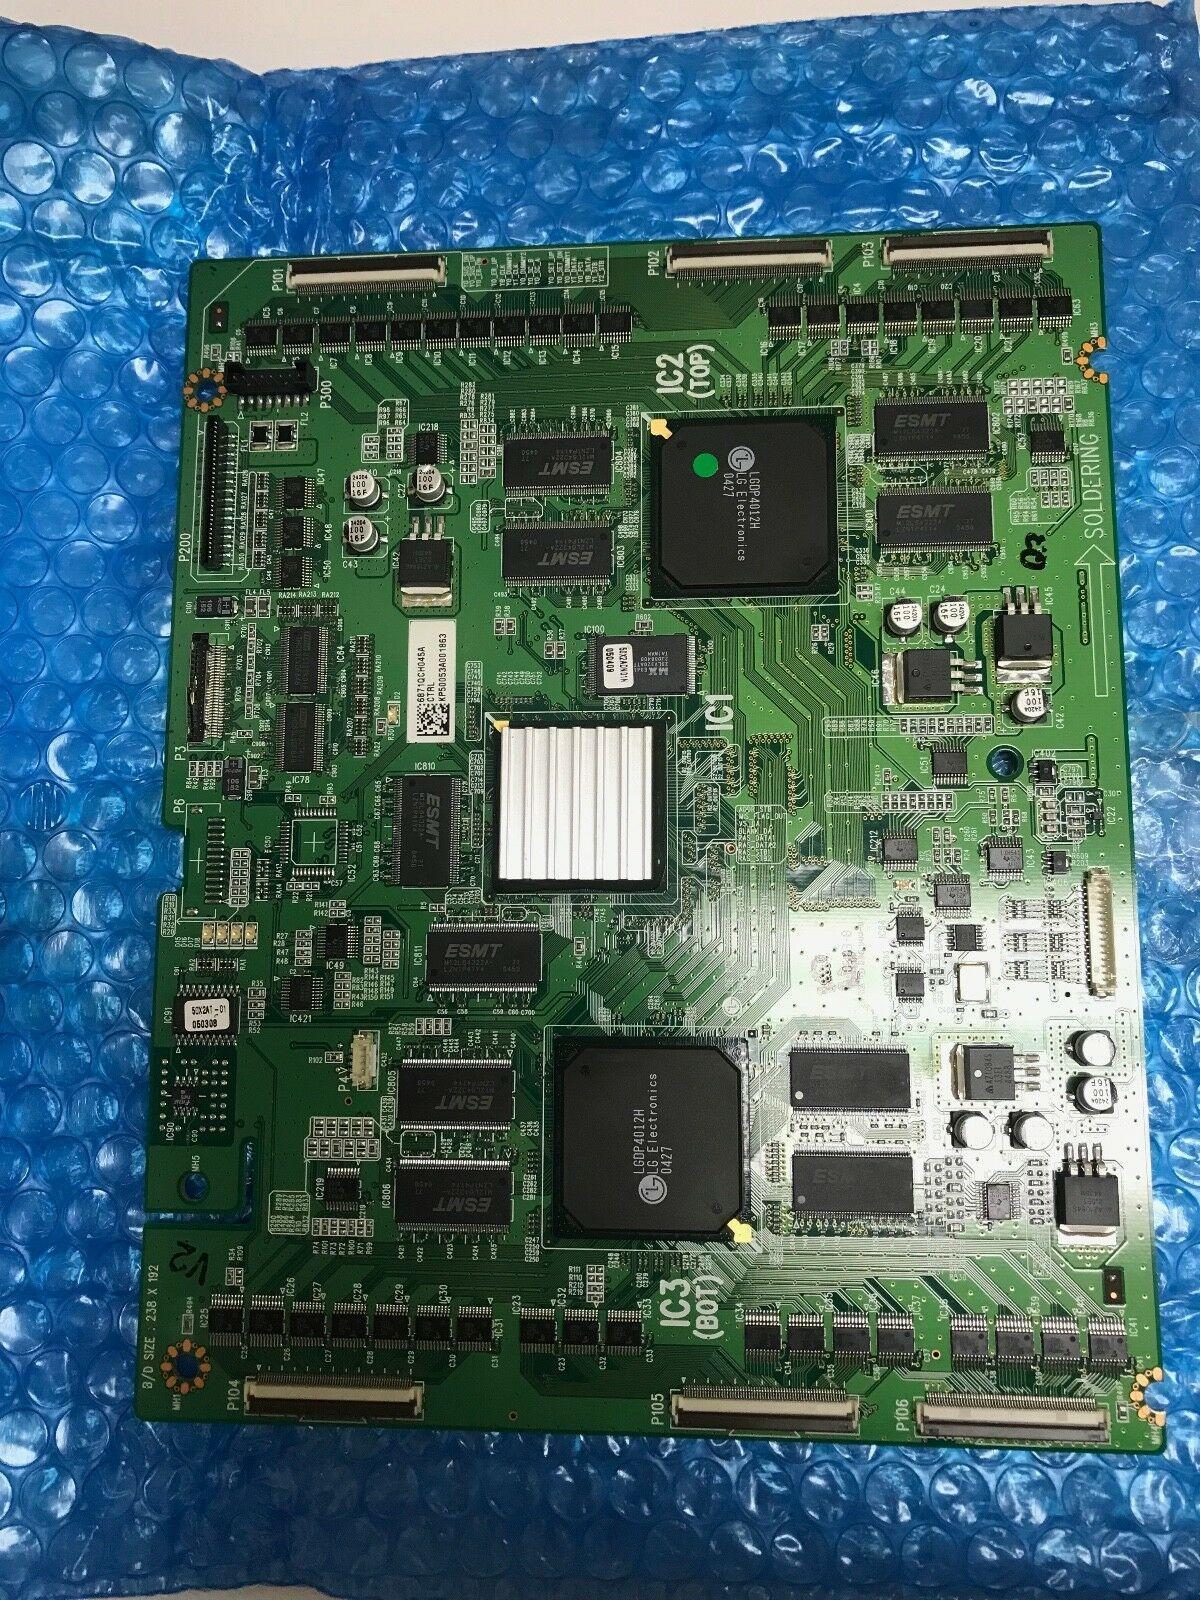 LG 6871QCH045A LOGIC BOARD 6870QCC011C DU-50PX10 DU-50PX10C DU-50PY10 RU-50PZ61